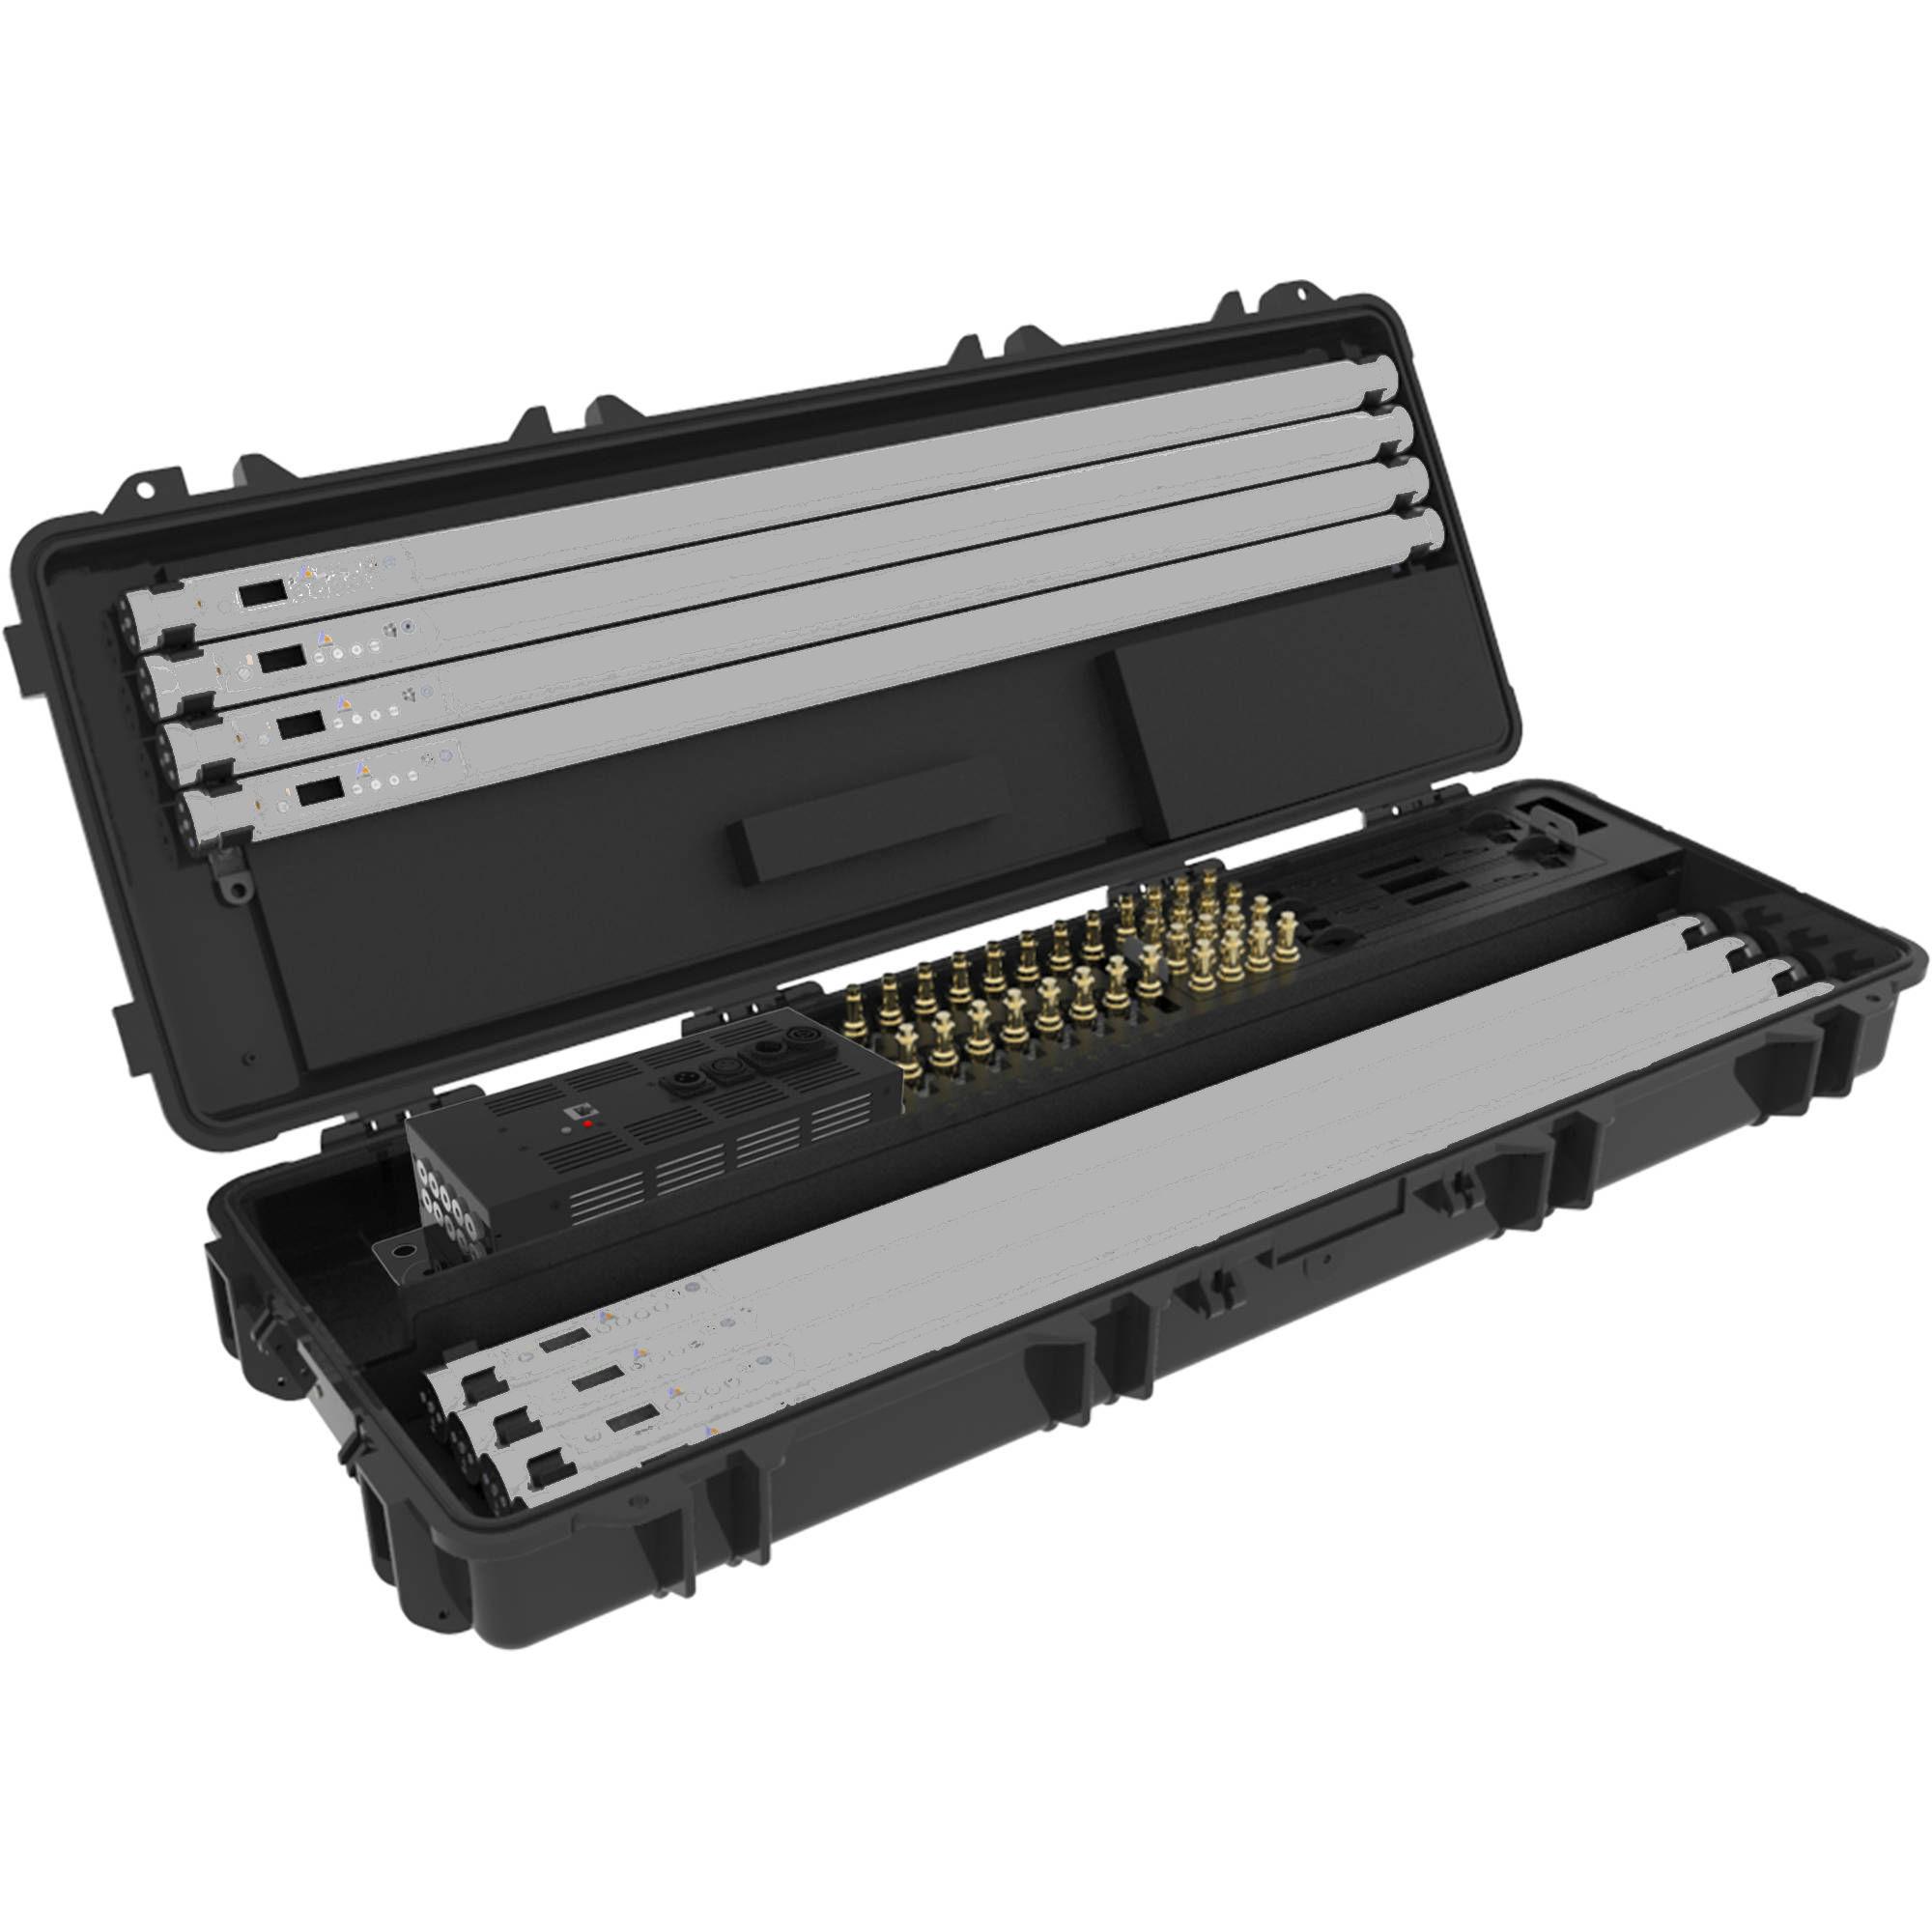 astera-fp1-chrcse-titan-tube-charging-case-w--accessories.jpeg